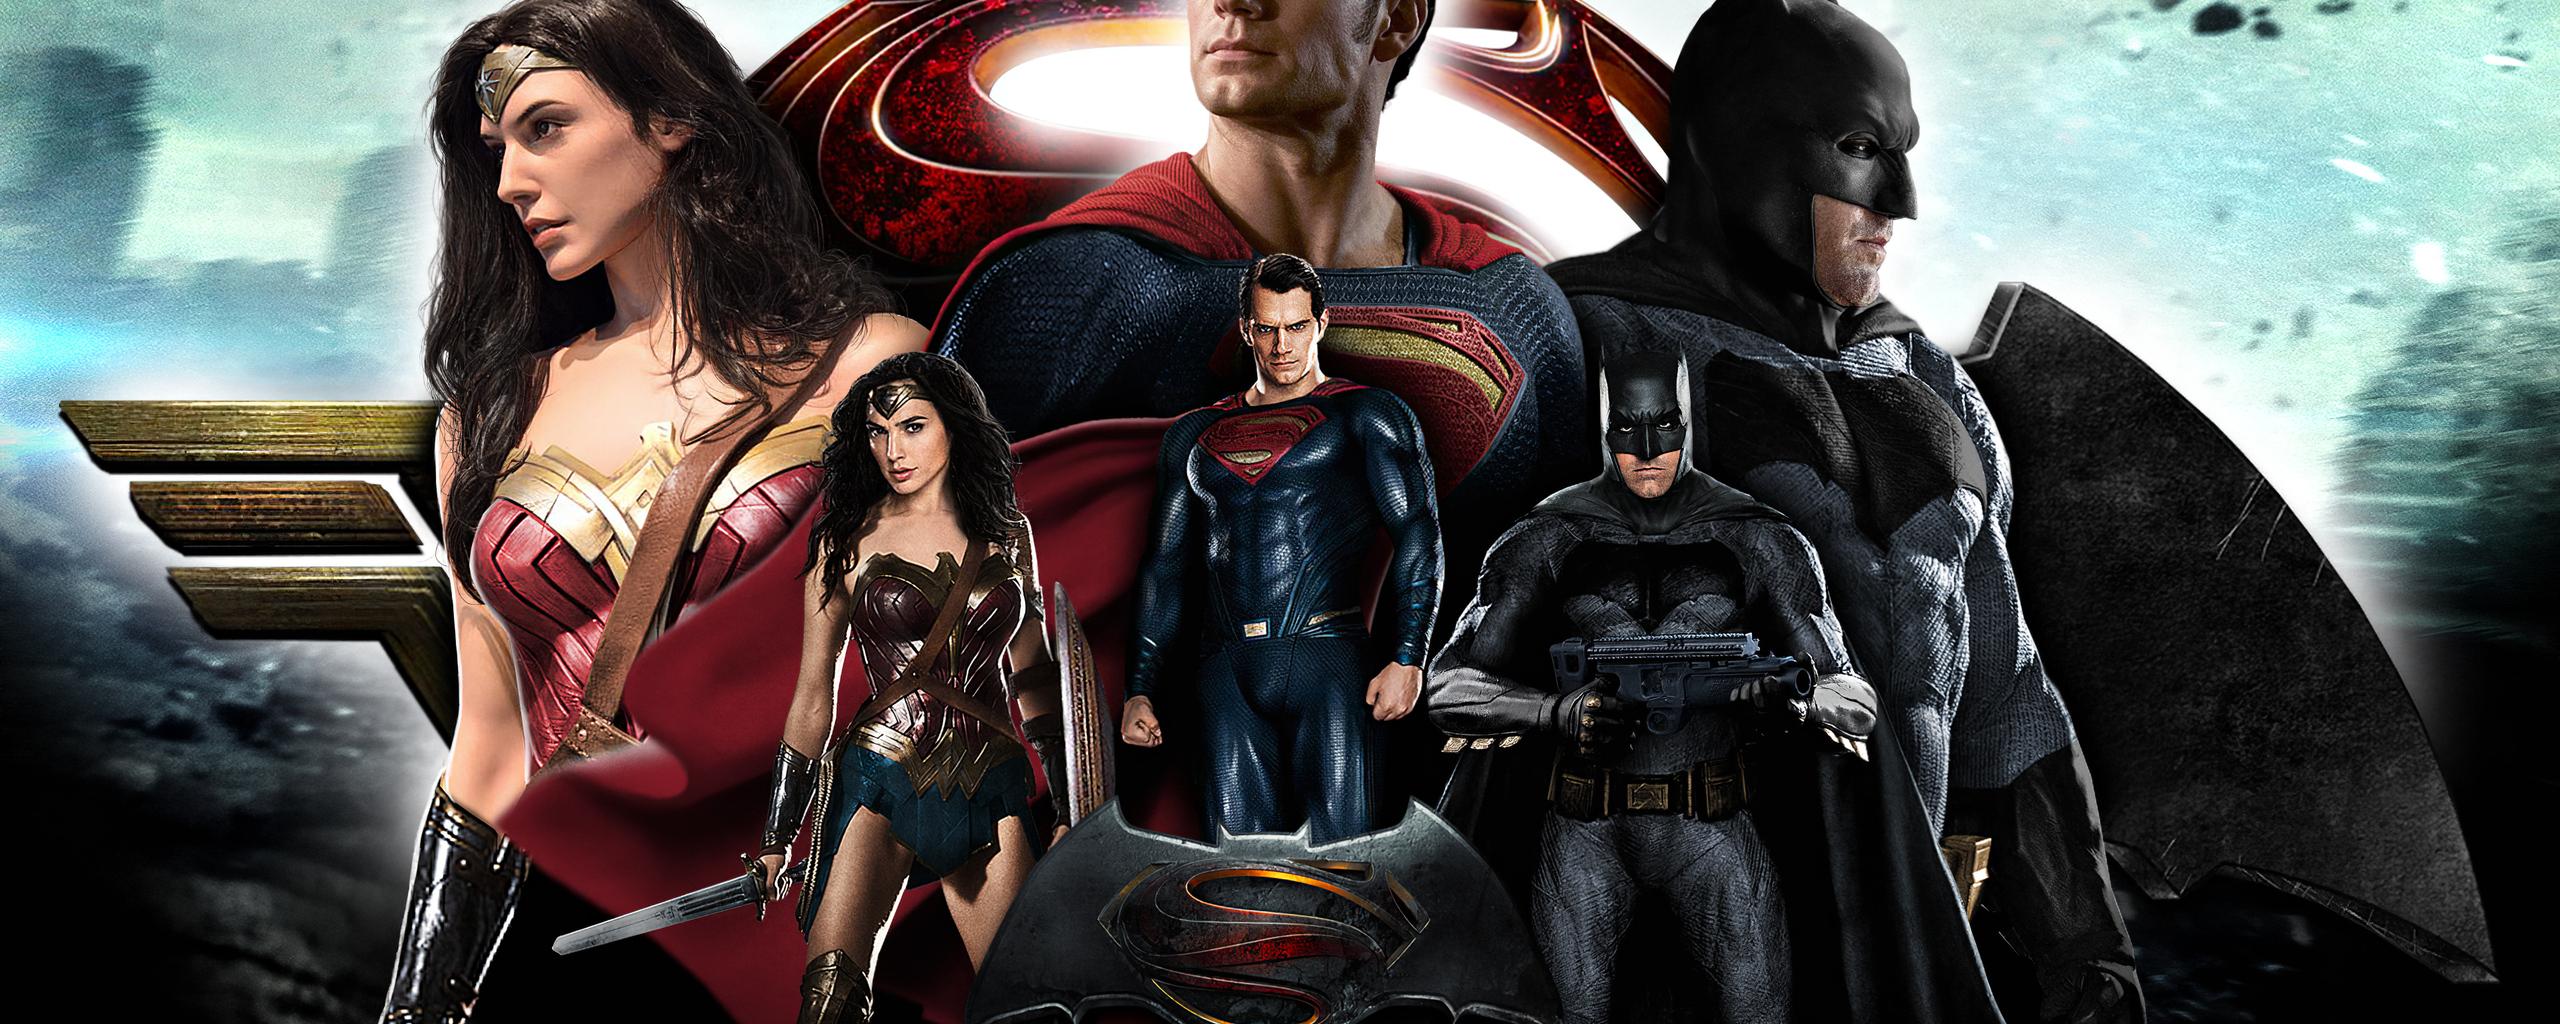 batman-wonder-woman-superman-yv.jpg